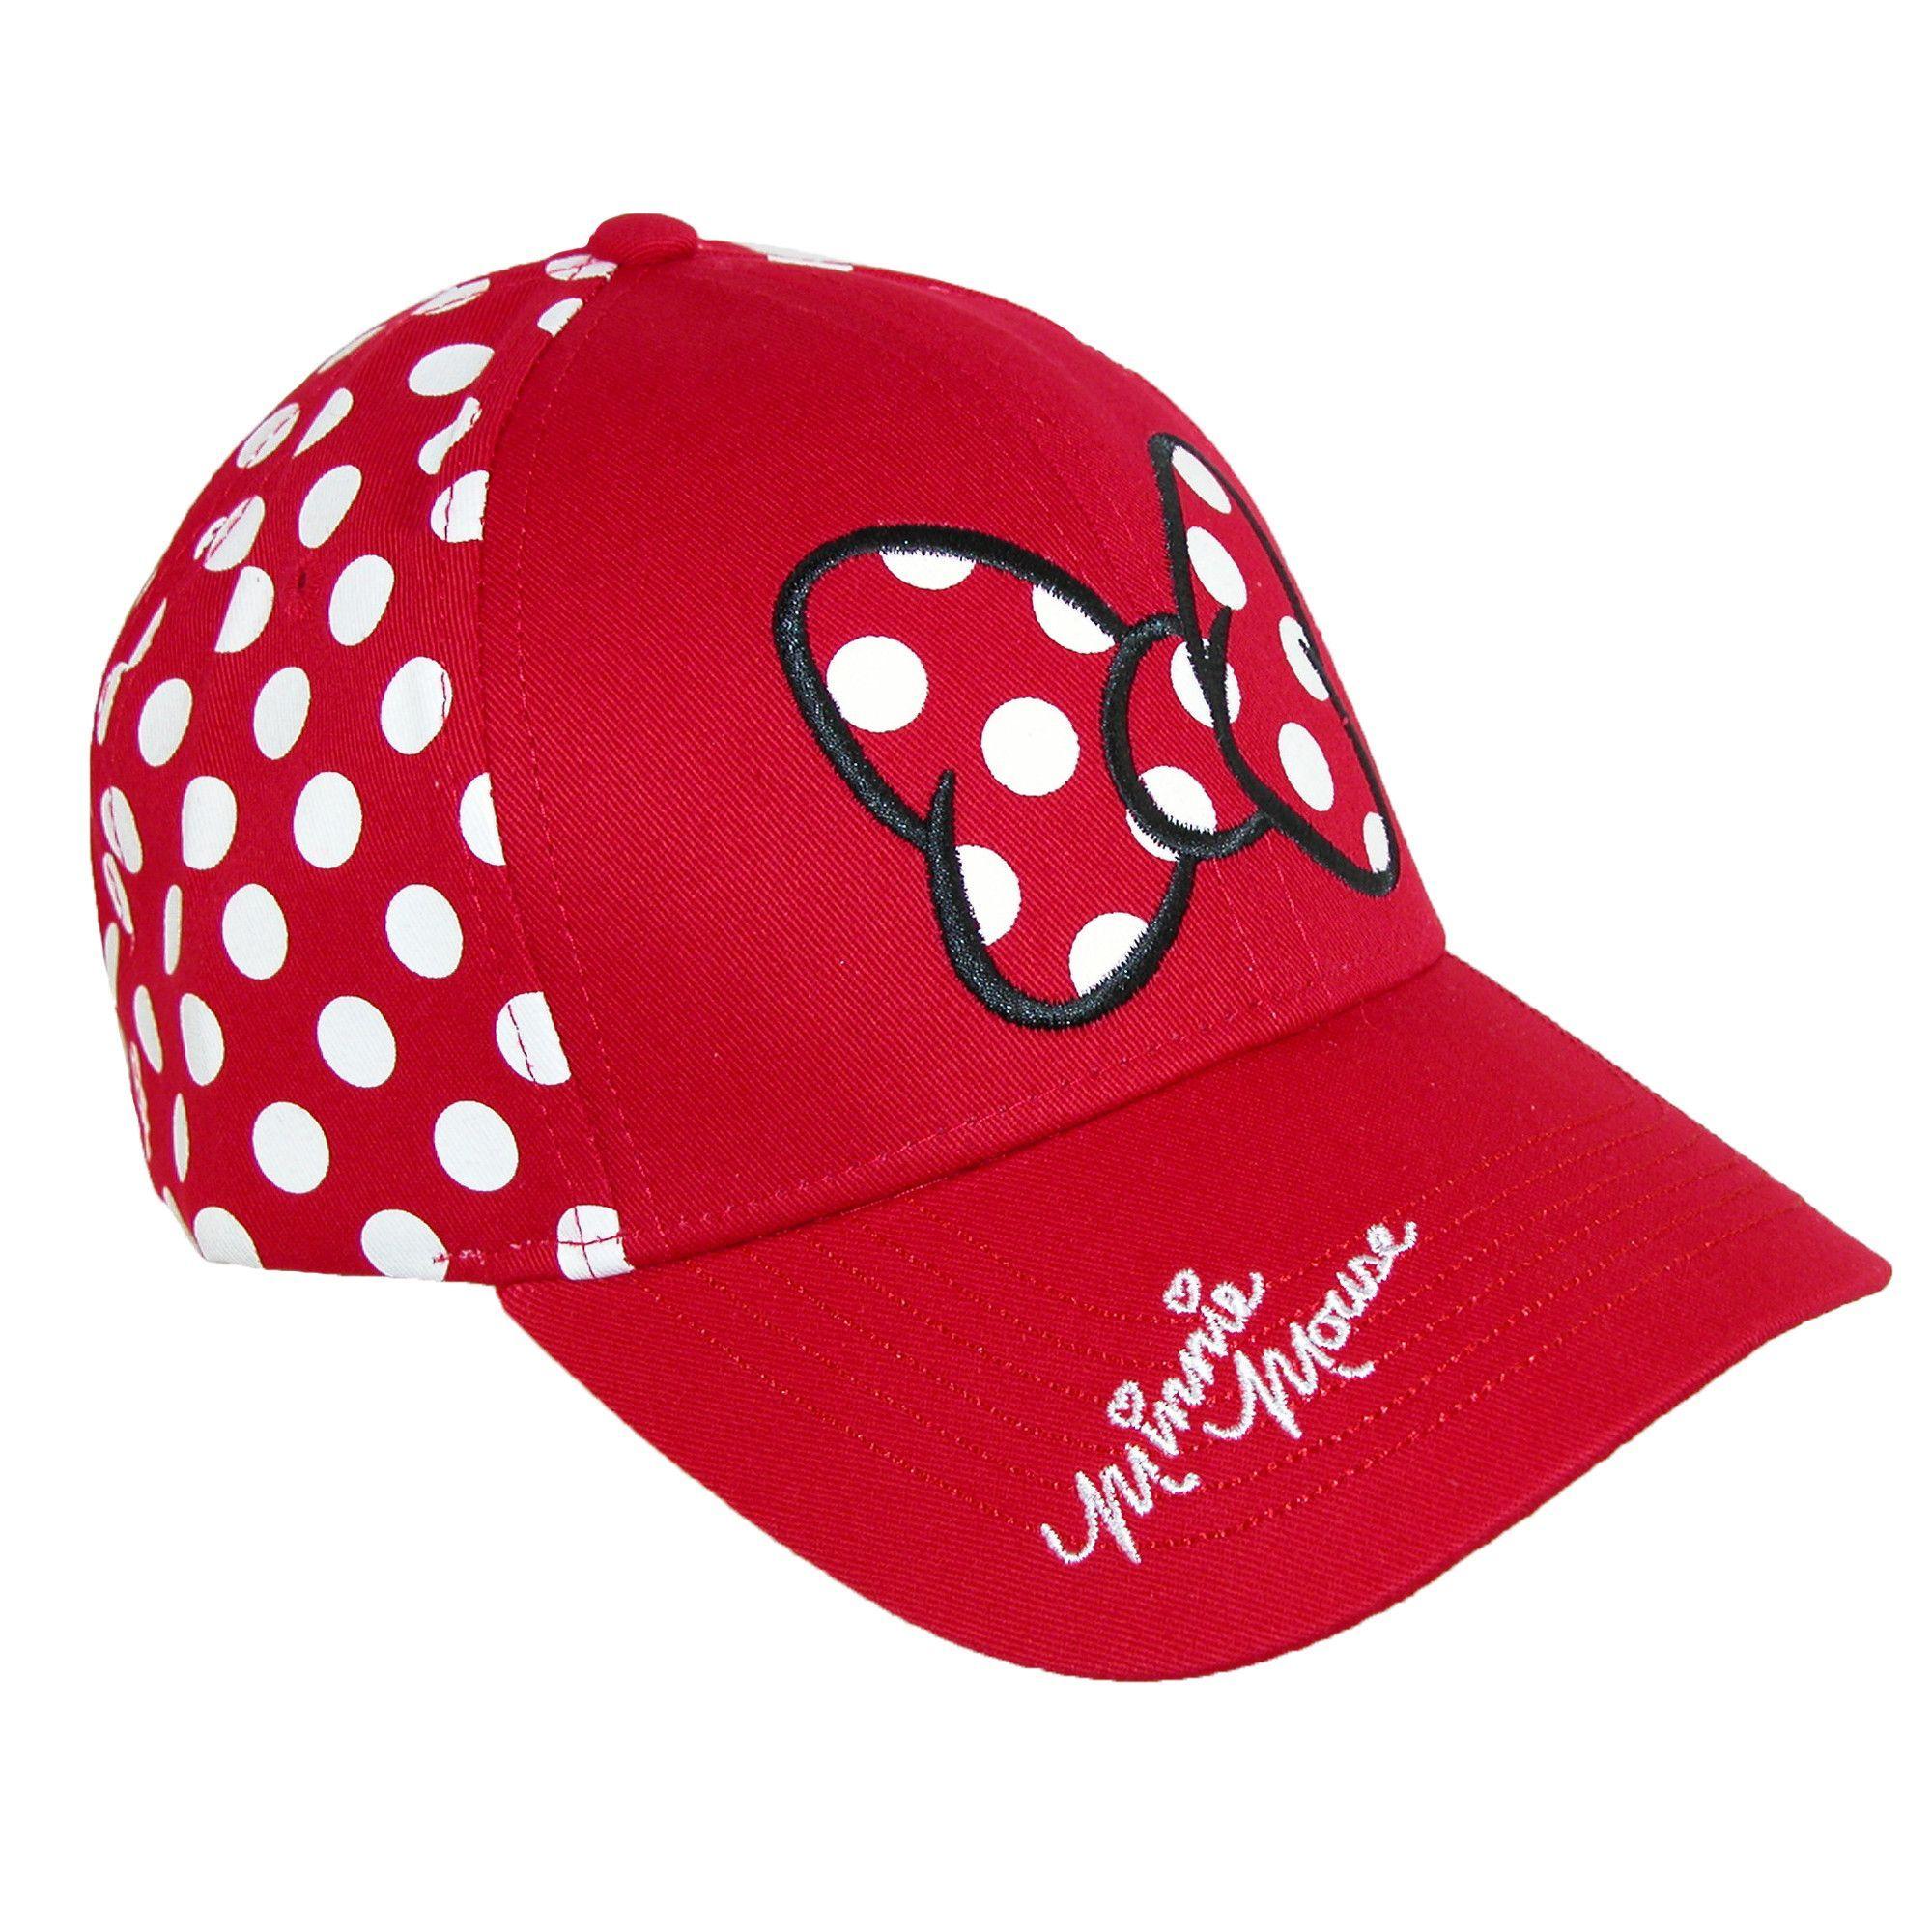 44a06bbdbf0 Disney womens minnie mouse polka dots baseball hat baseball caps jpg  2000x2000 Disney caps